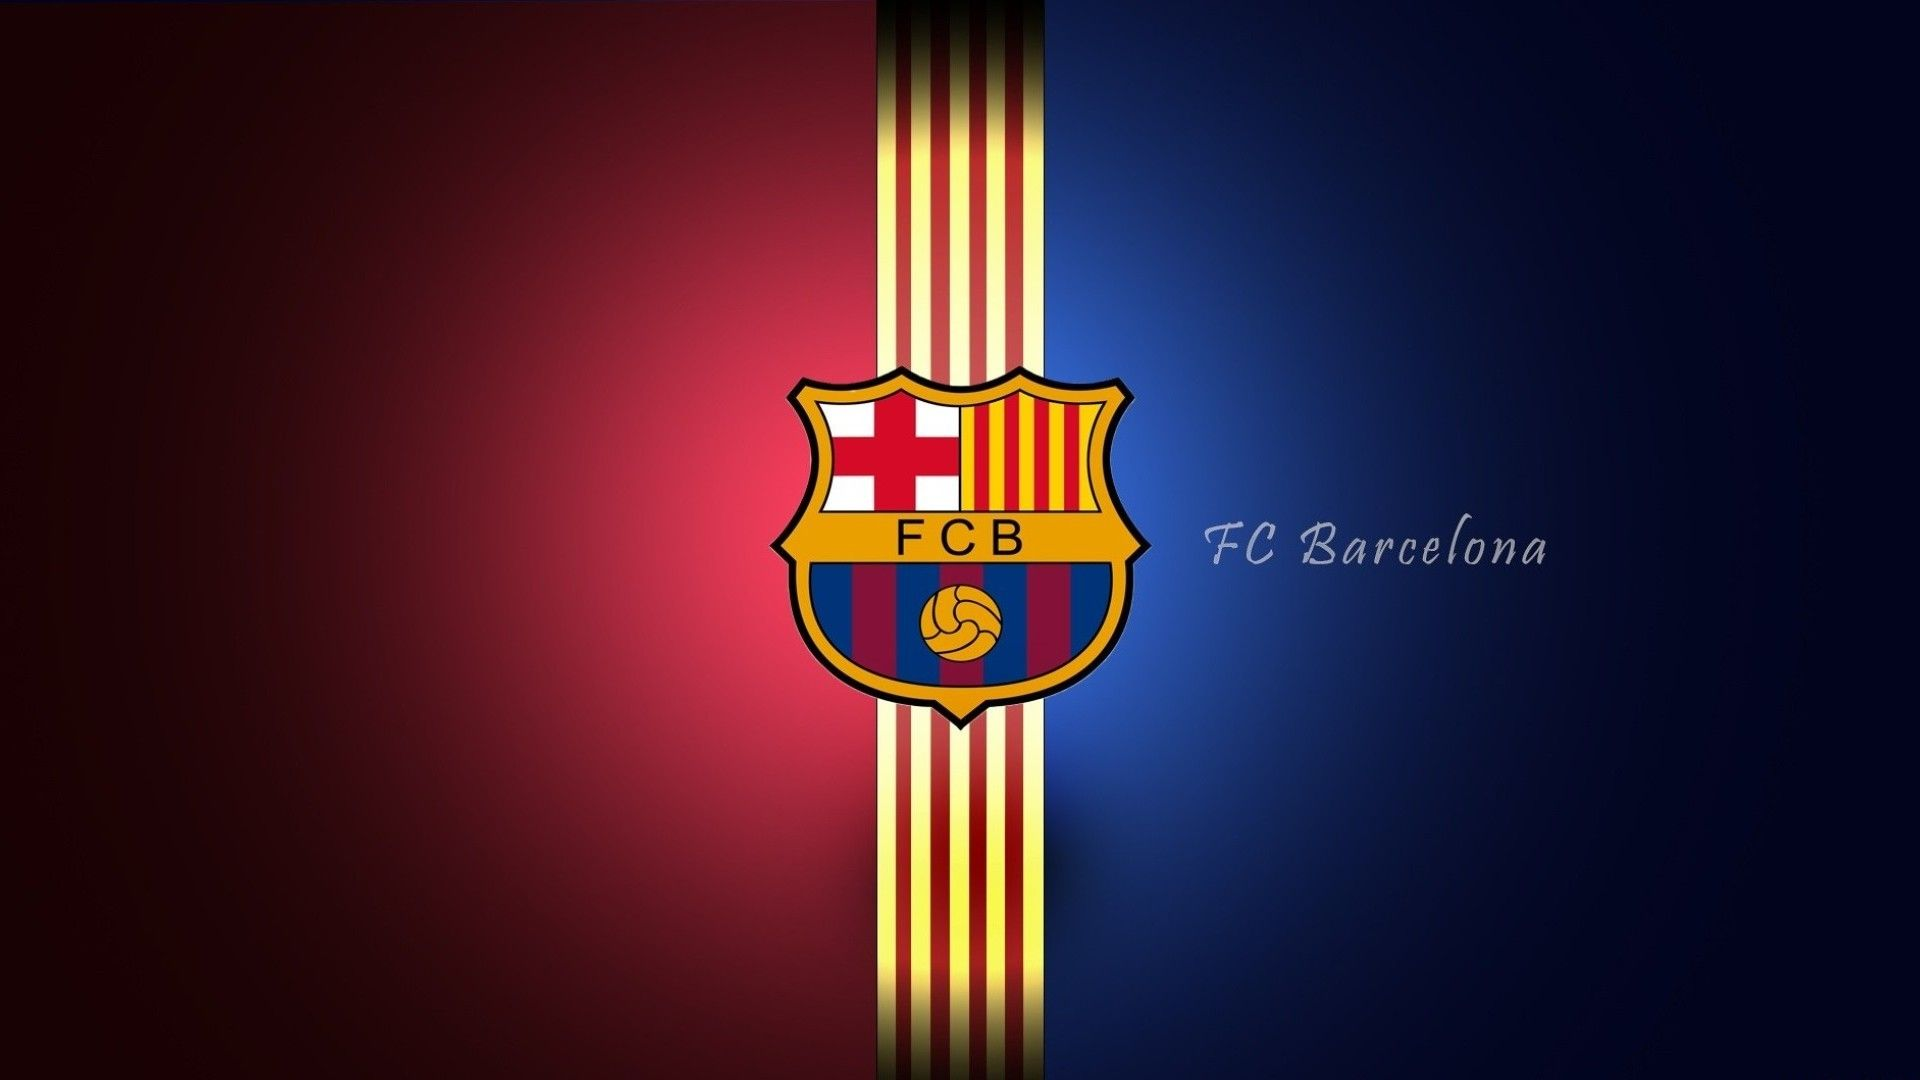 Barcelona Wallpapers Top Free Barcelona Backgrounds